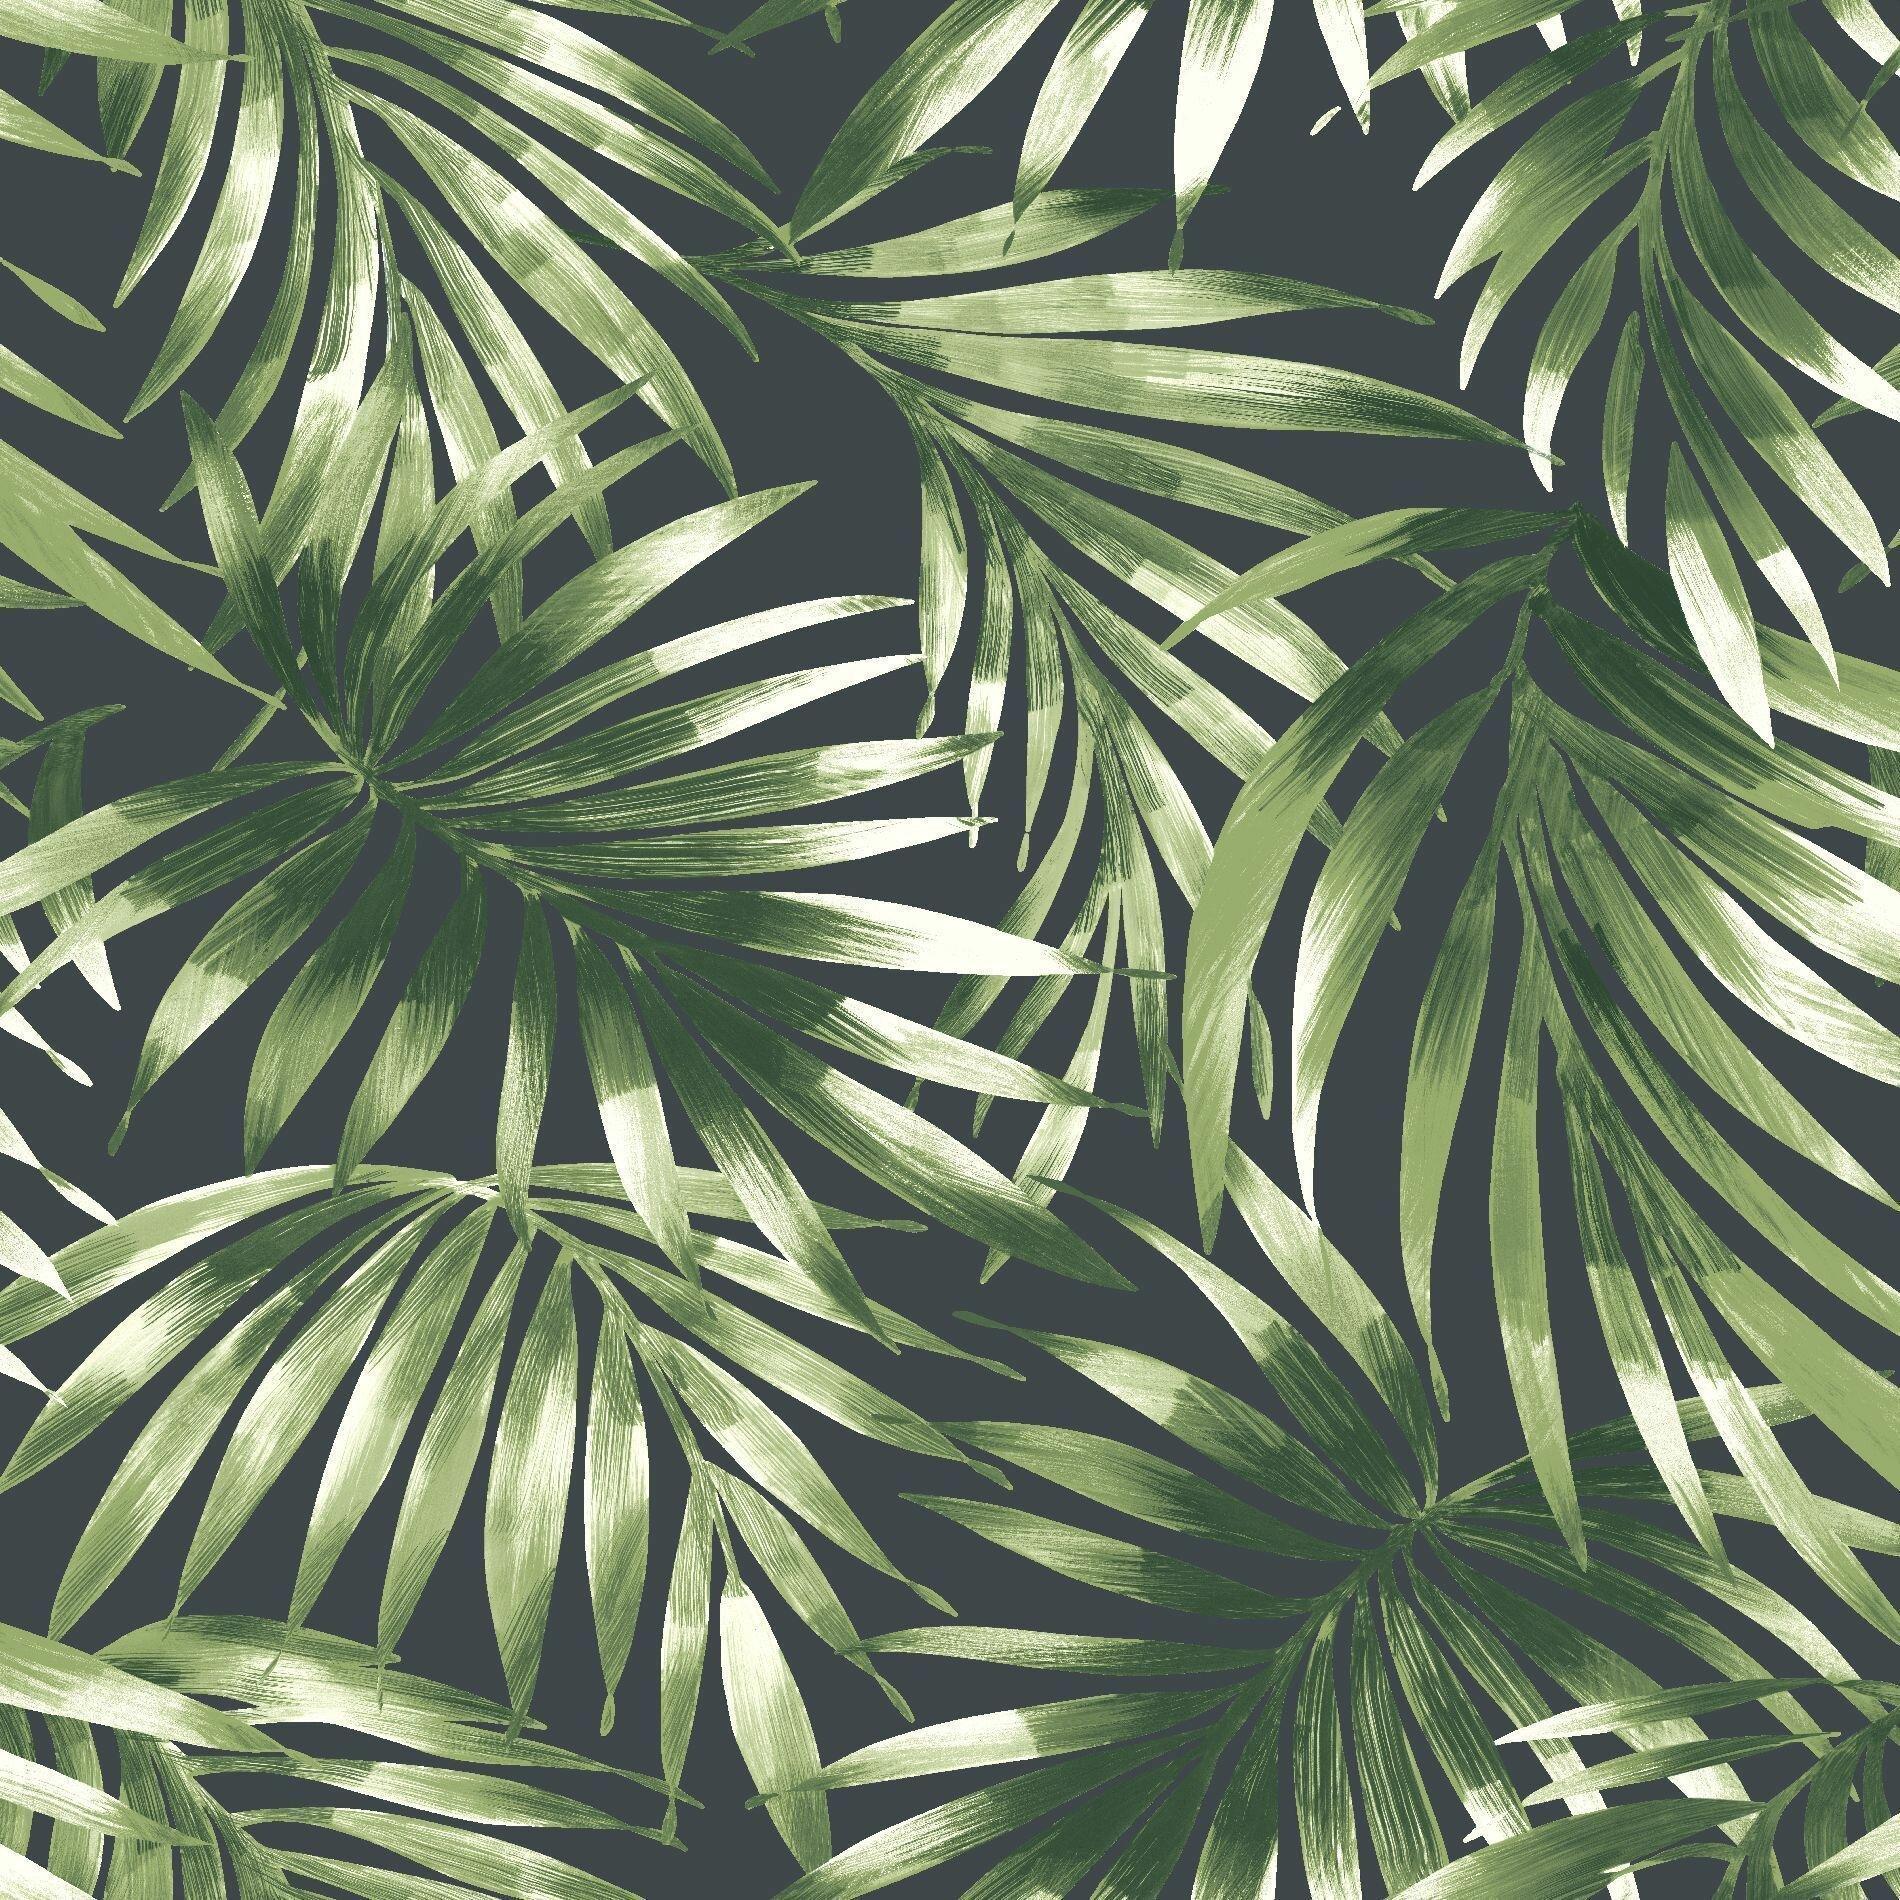 52cm x 10.5m East Urban Home Nocturnum Leaf 10m x 52cm Wallpaper Roll